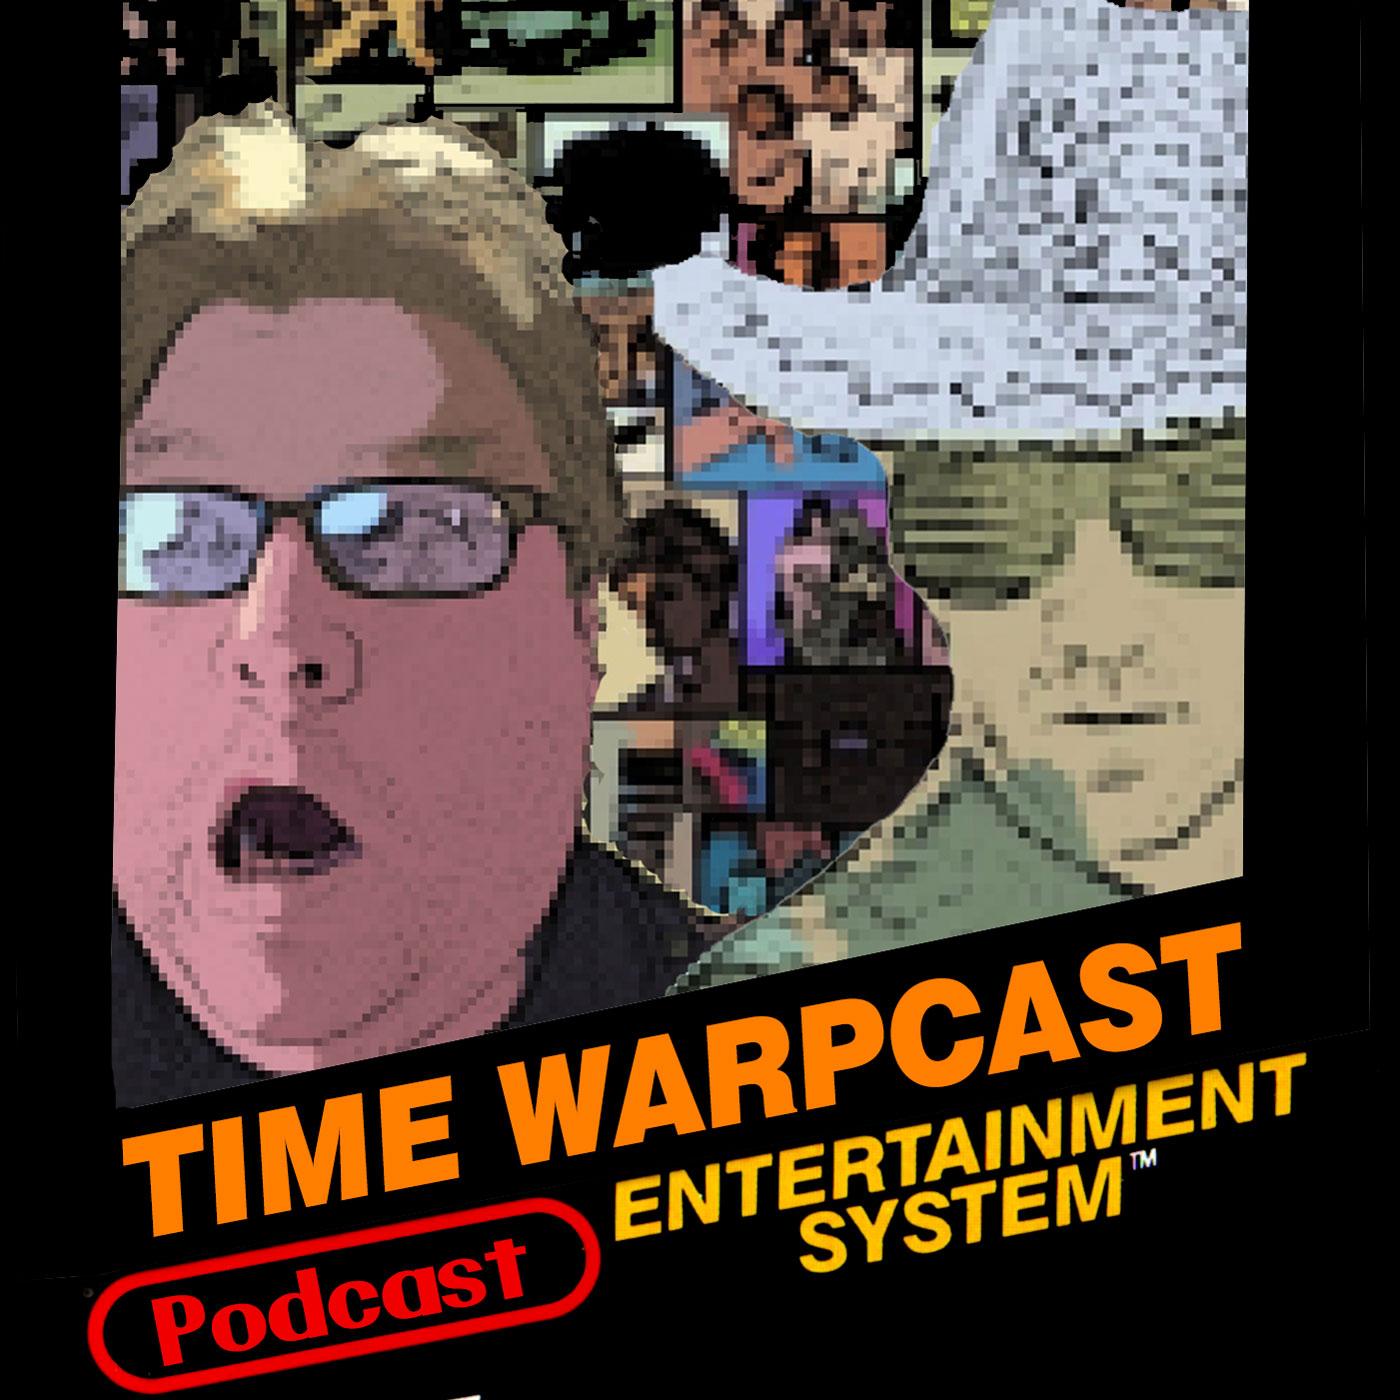 Time Warpcast